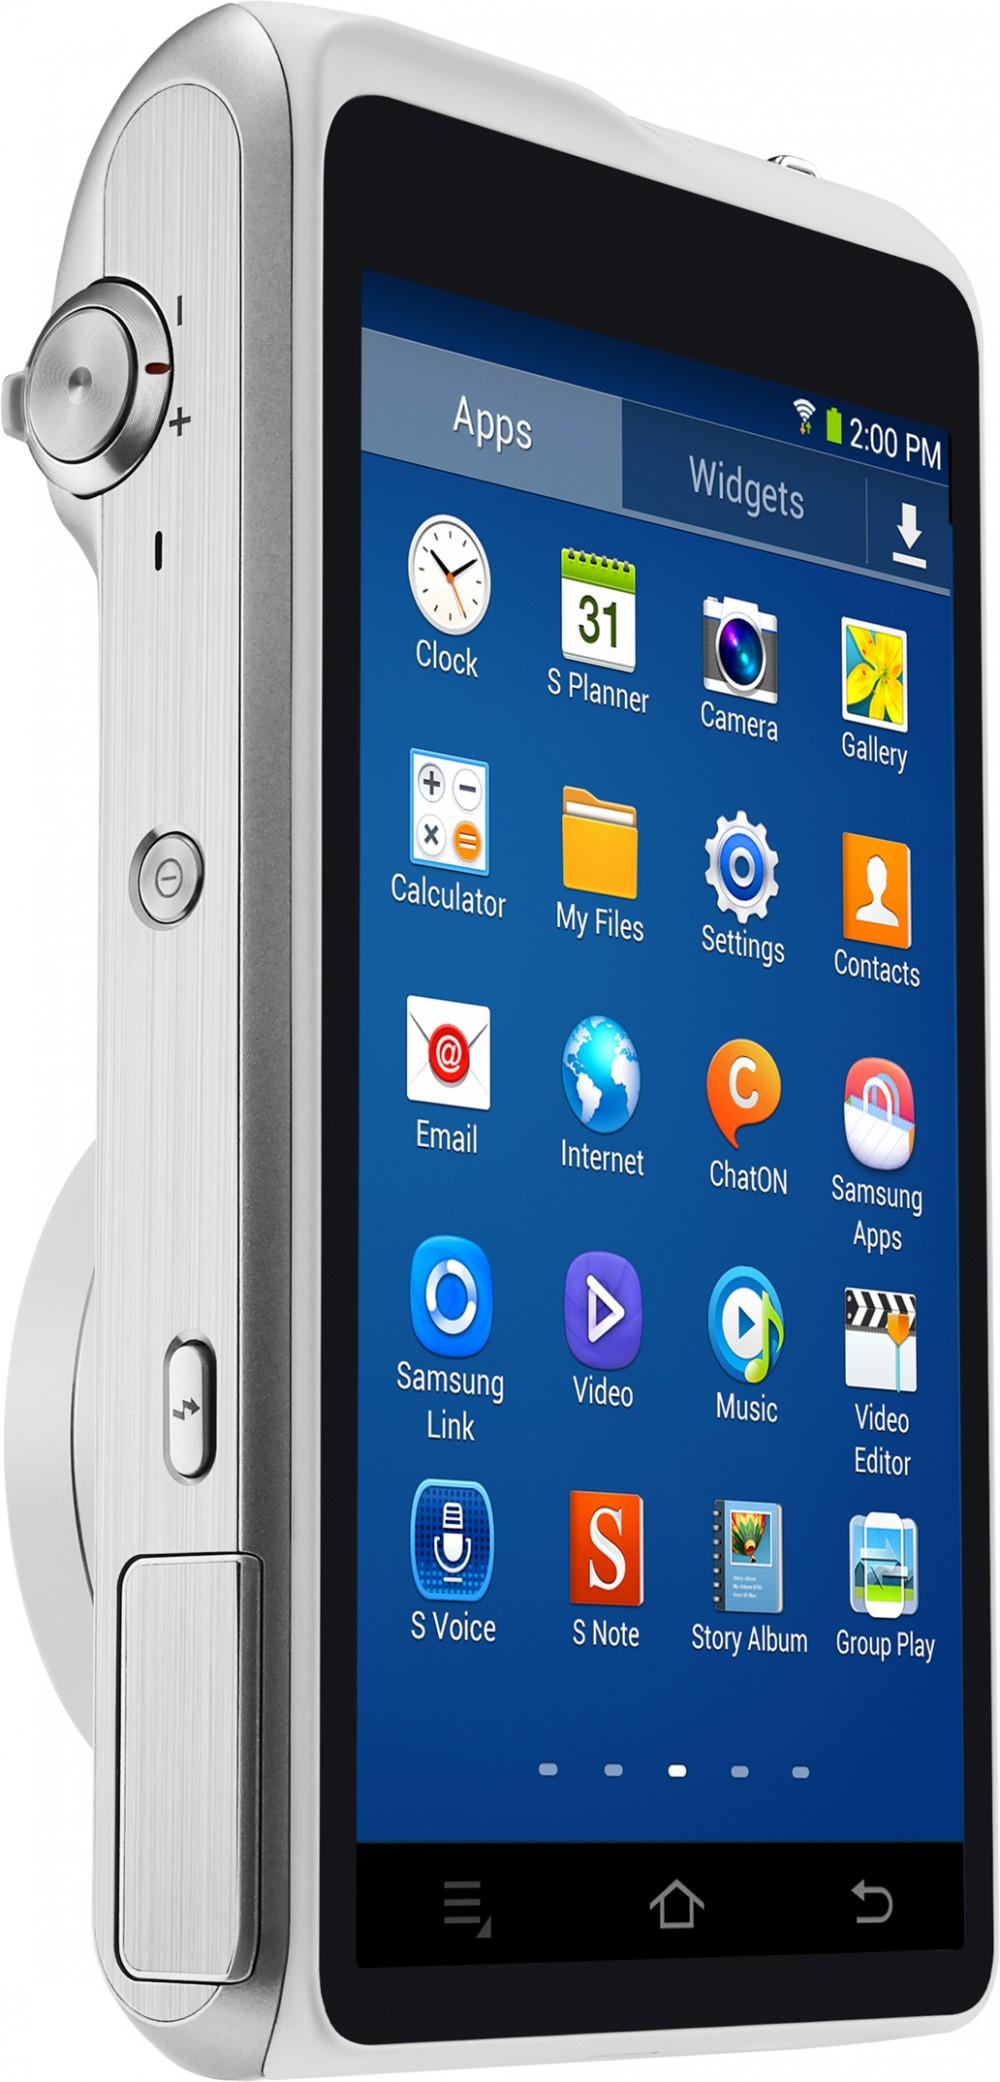 Samsung Galaxy Camera 2 GC200 | CellphoneS.com.vn-6